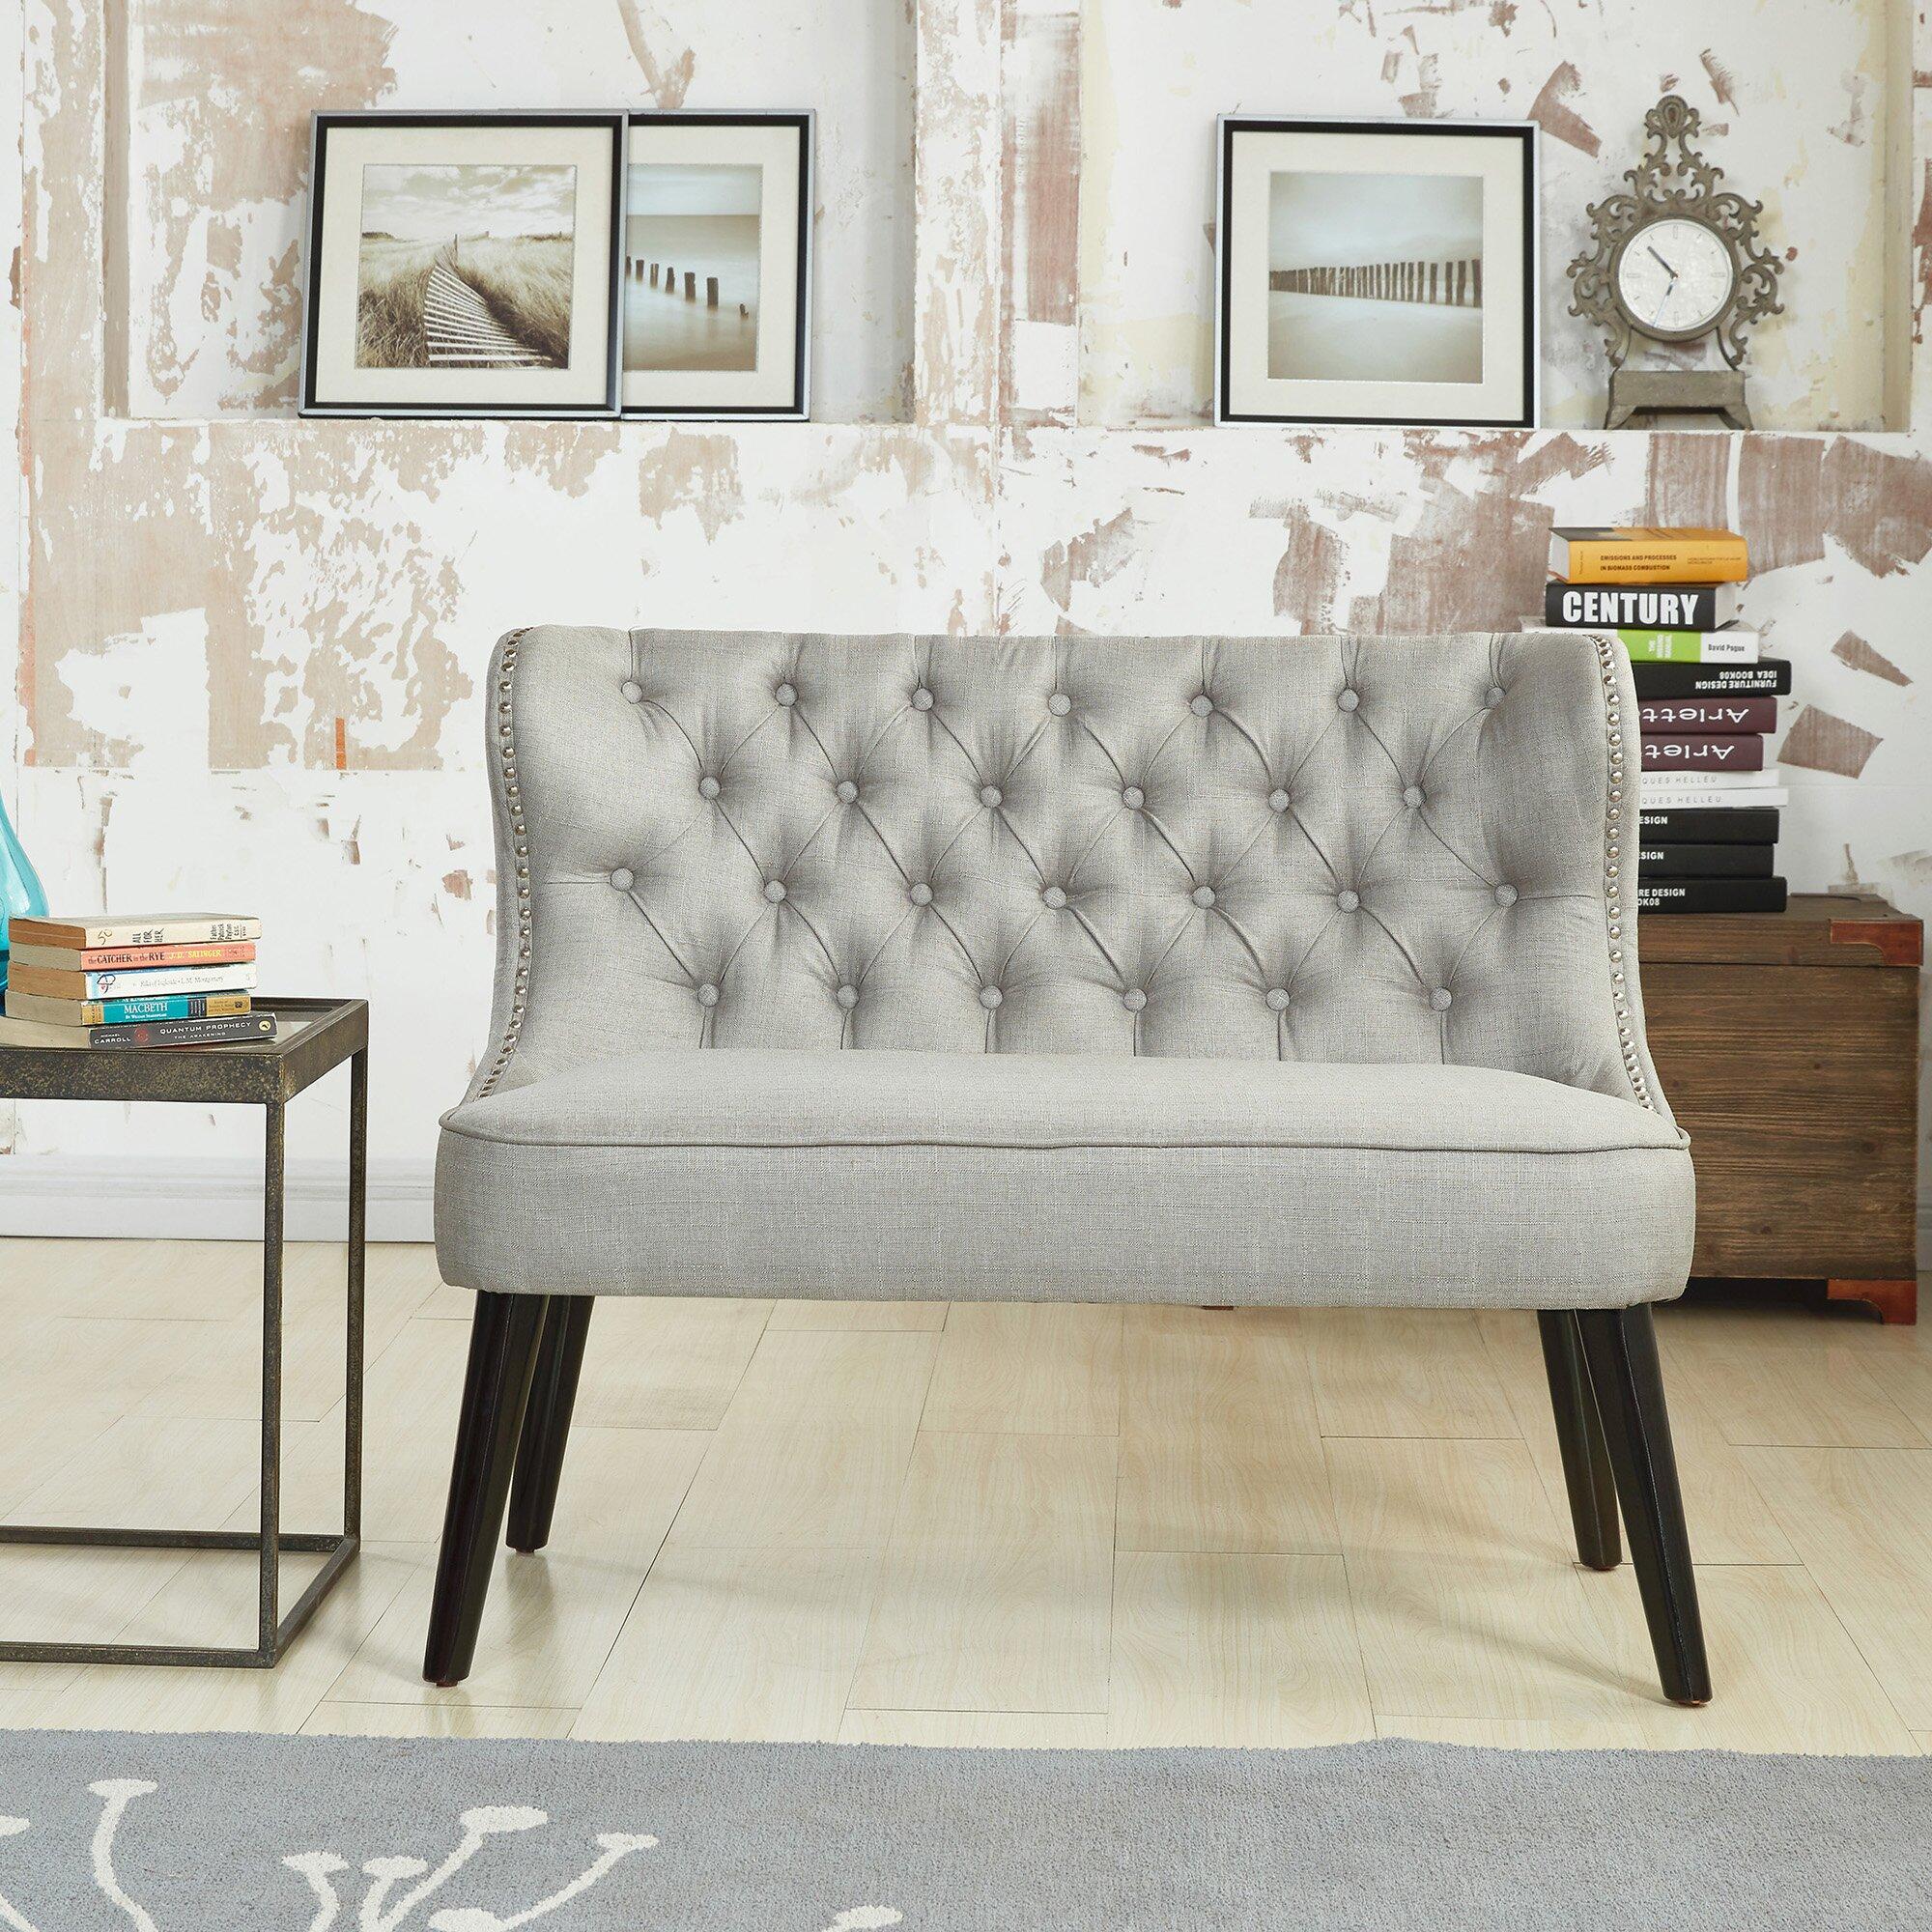 Doring Tufted Wing Back Settee Bedroom Bench & Reviews | Birch Lane